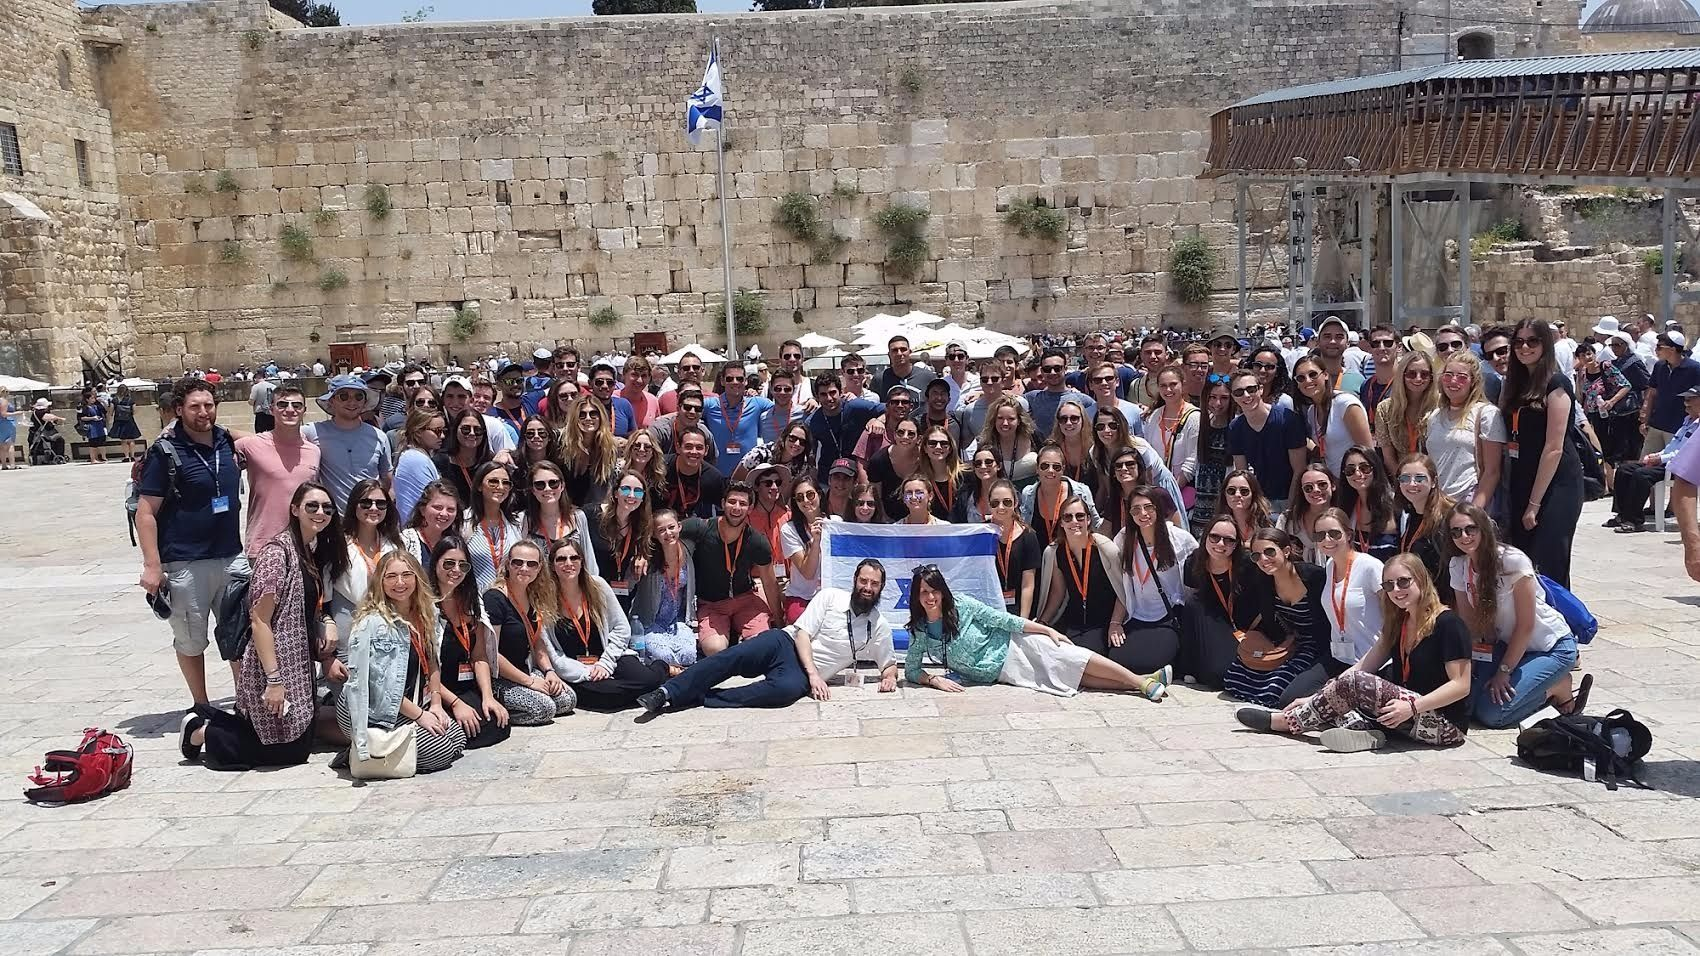 Jewish students from Vanderbilt University